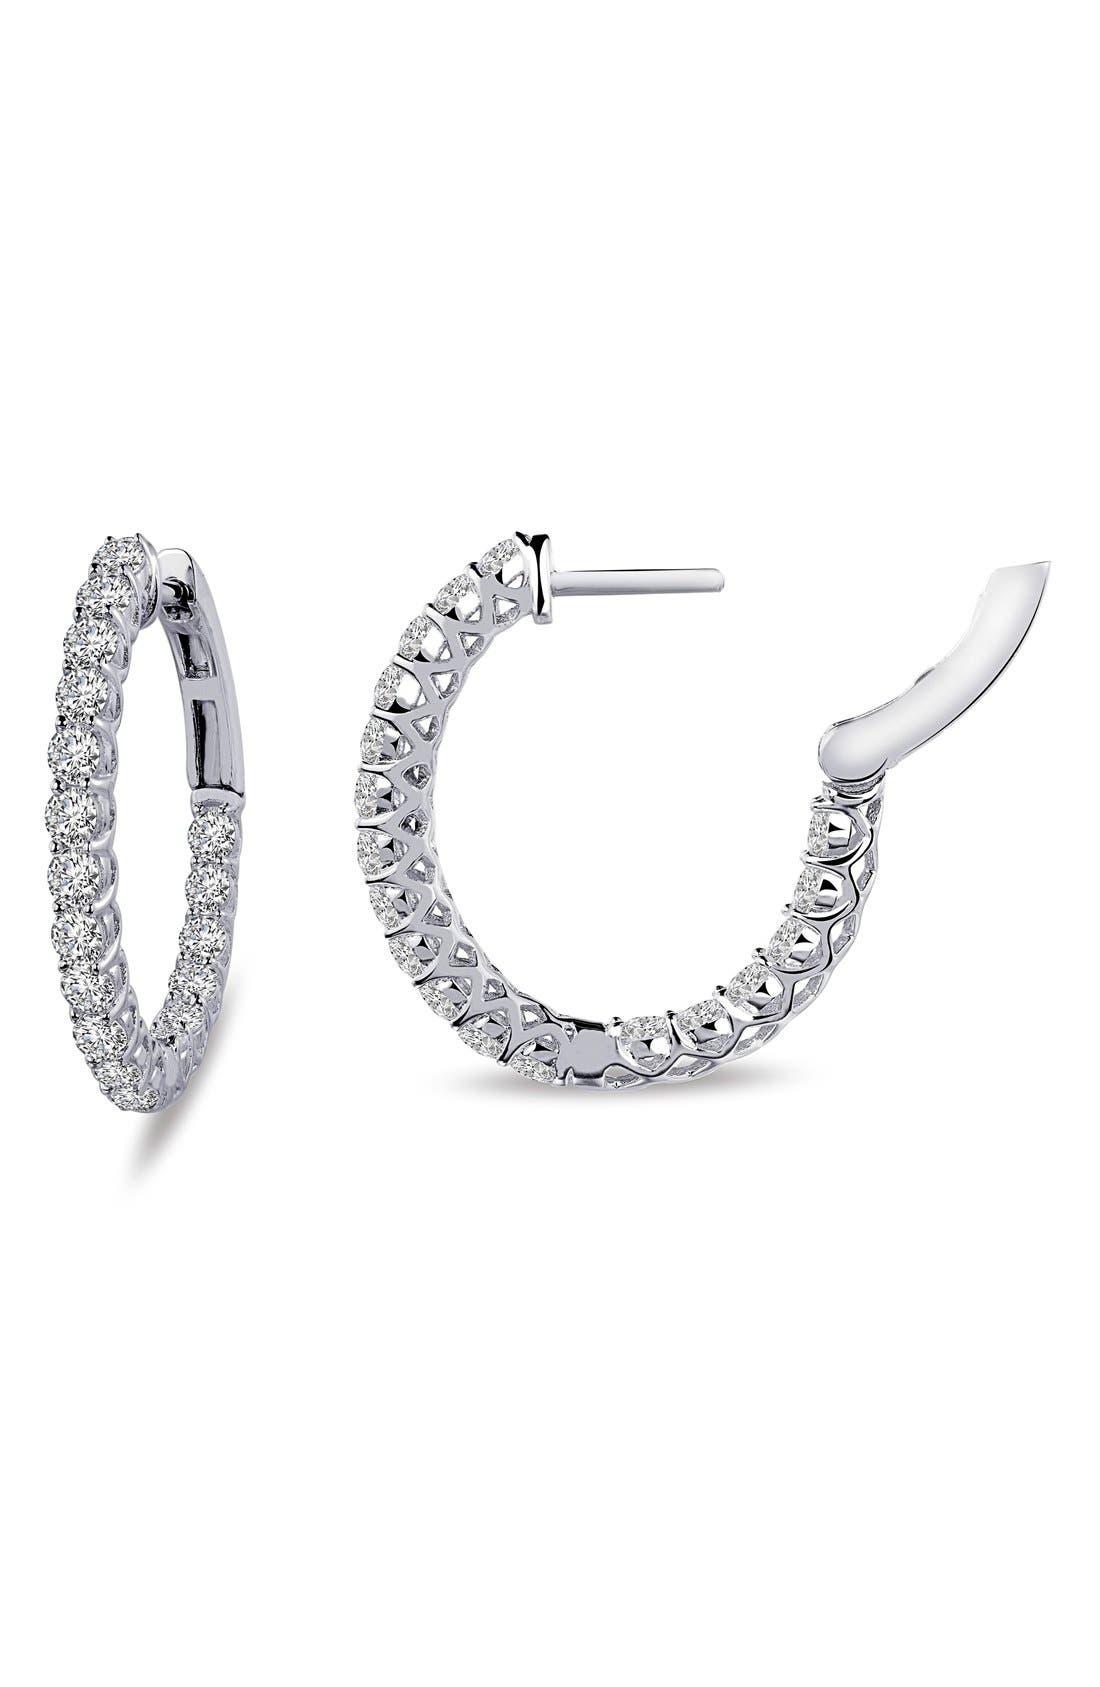 'Lassaire' Oval Hoop Earrings,                             Main thumbnail 1, color,                             SILVER